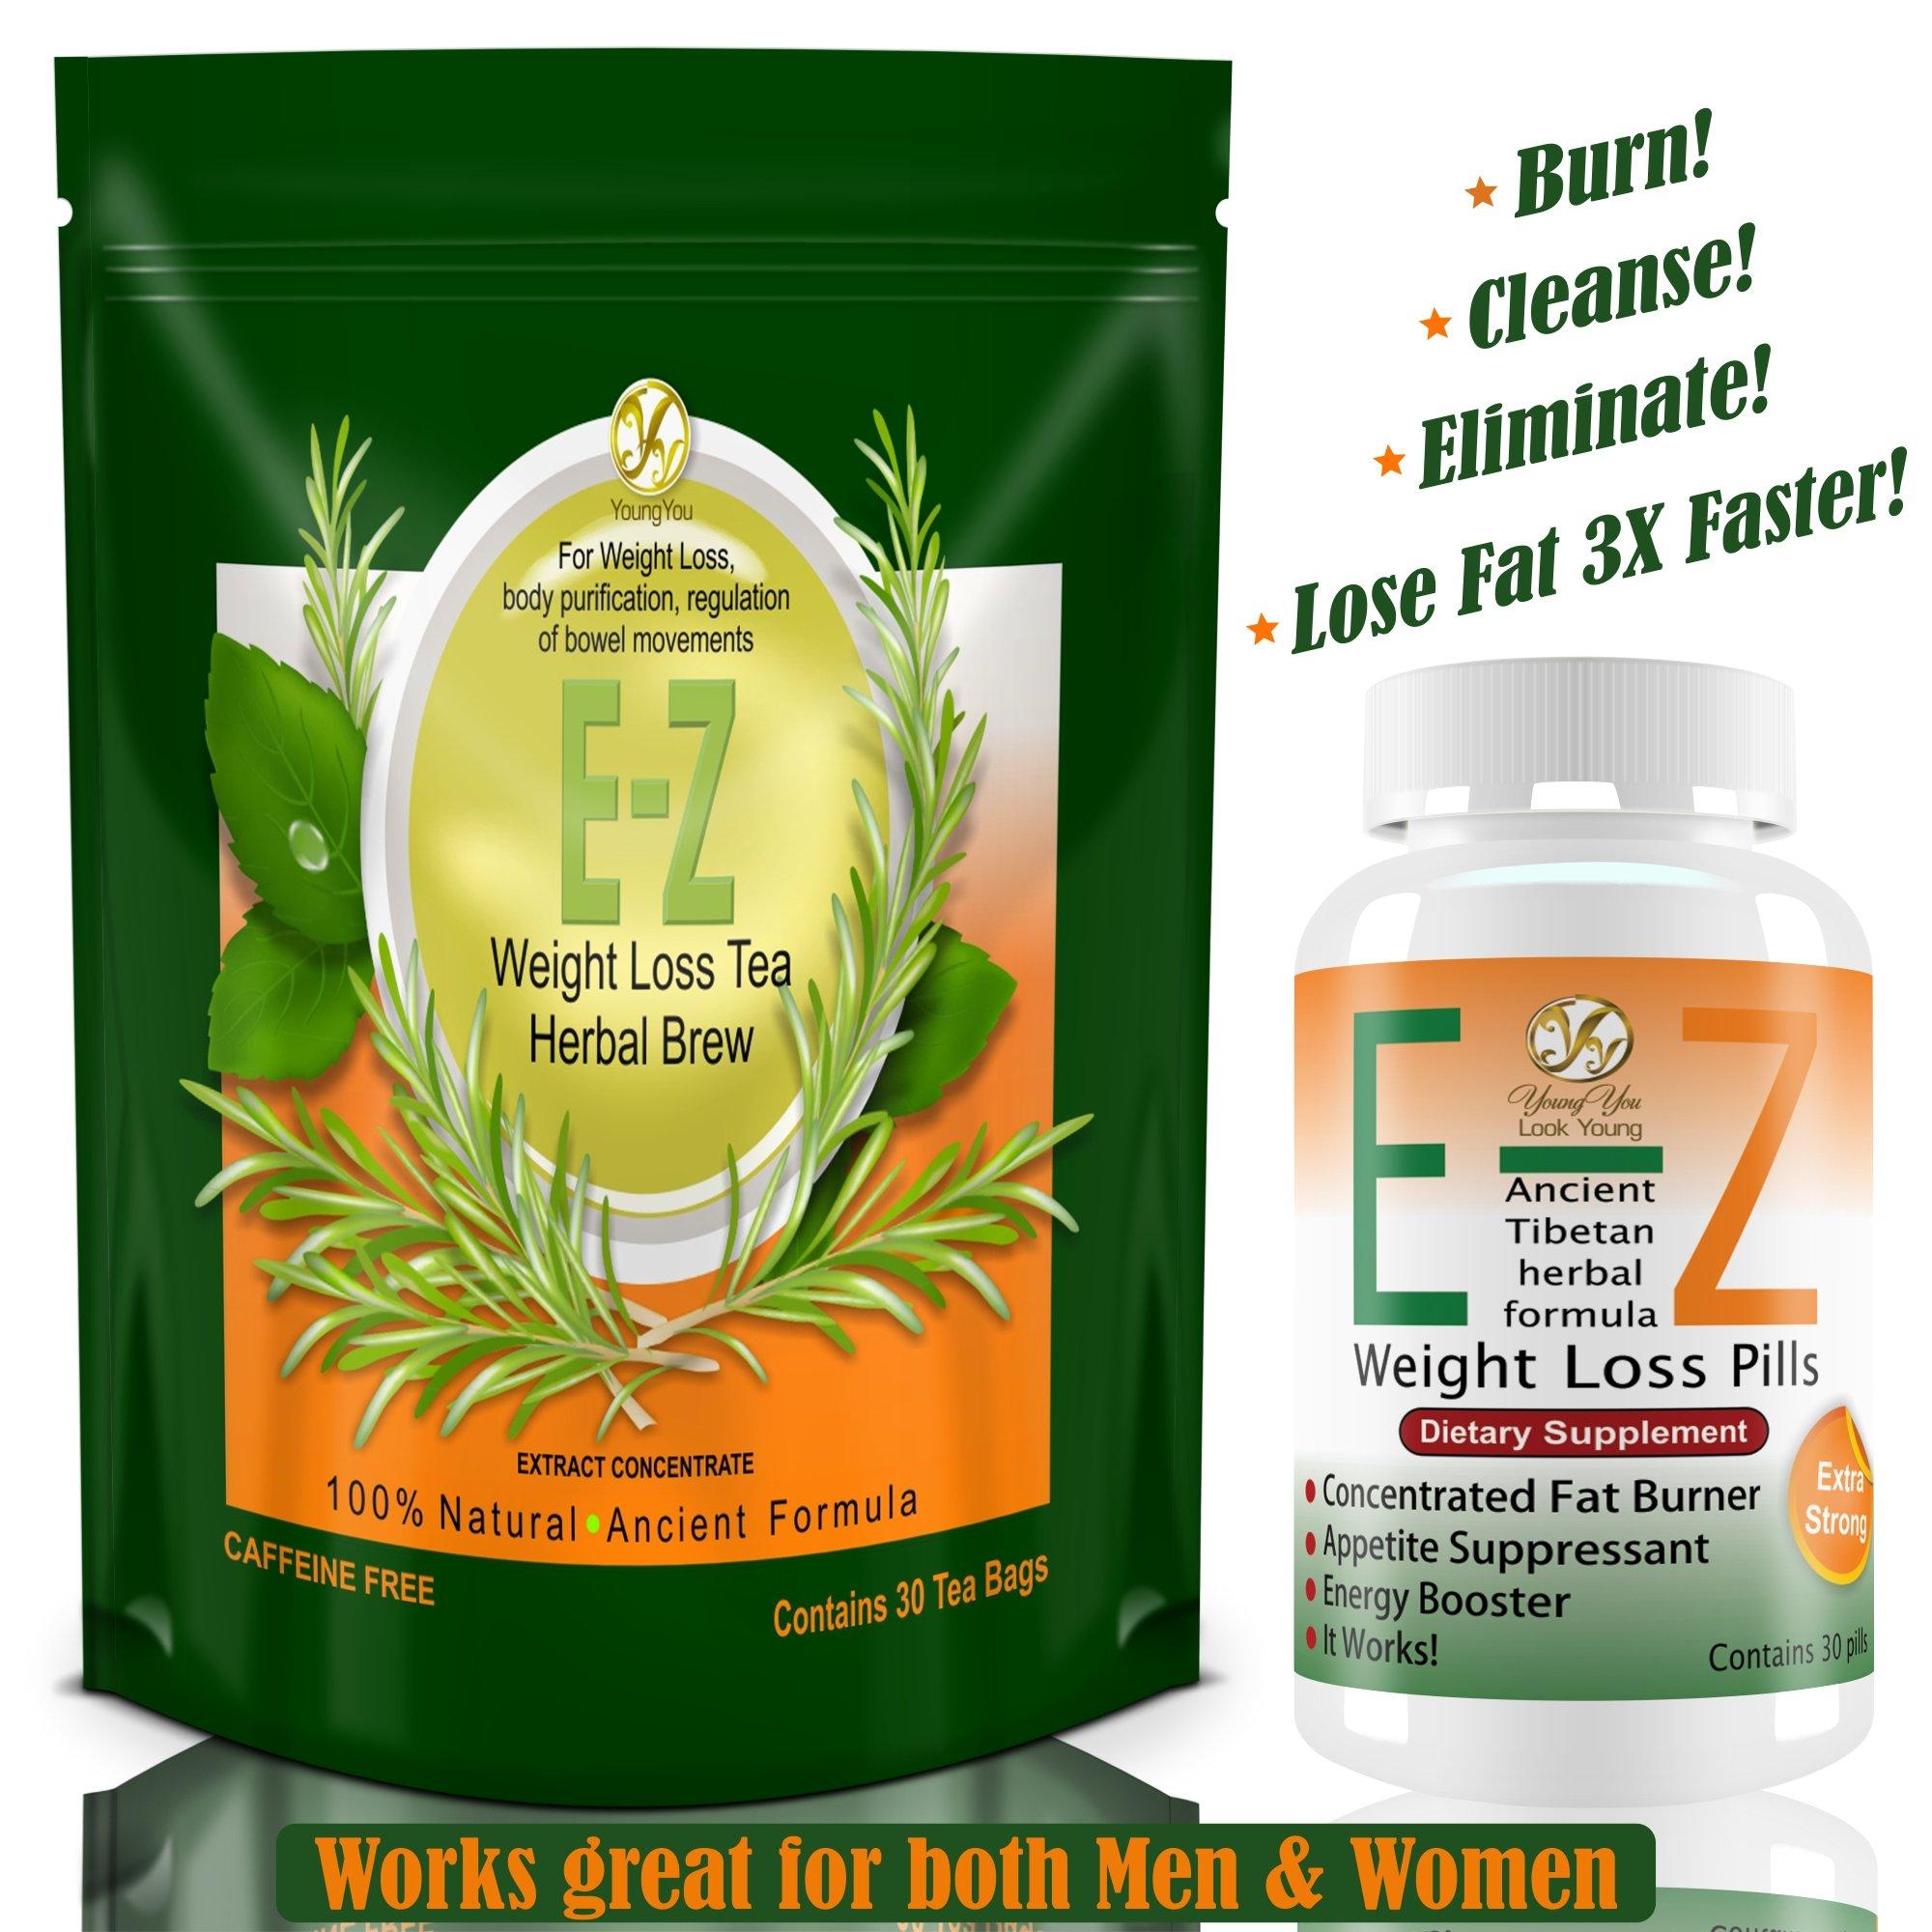 E-Z Weight Loss Pills + EASY Diet Tea. Fat Burner & Appetite Suppressant.